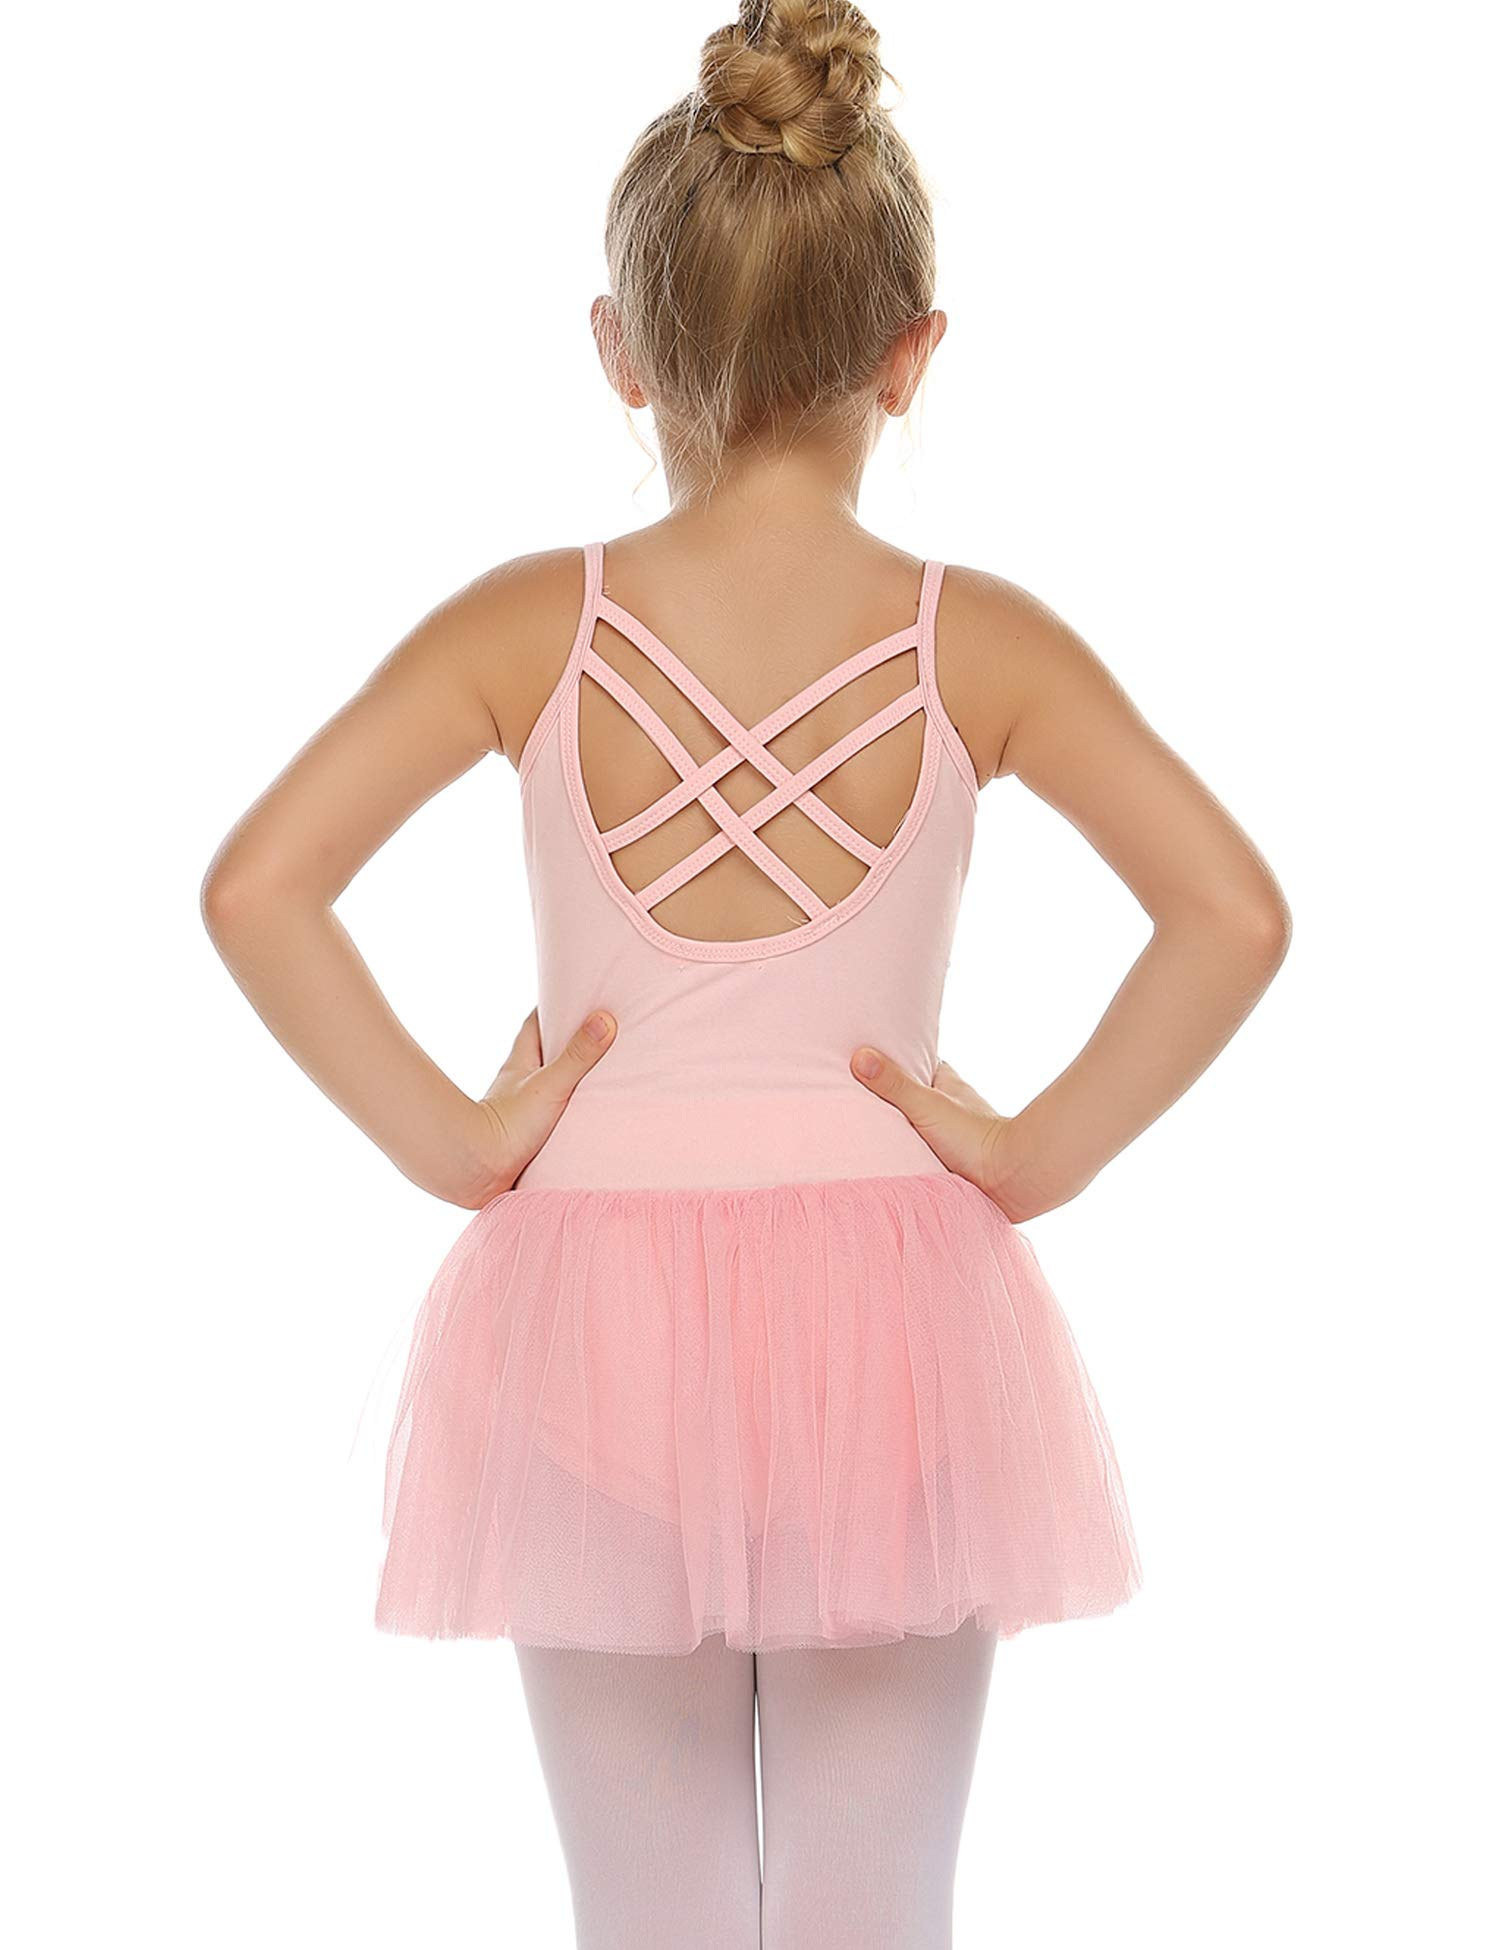 Zaclotre Girls Classic Long Sleeve Dance Dresses Ballet Skirted Leotard